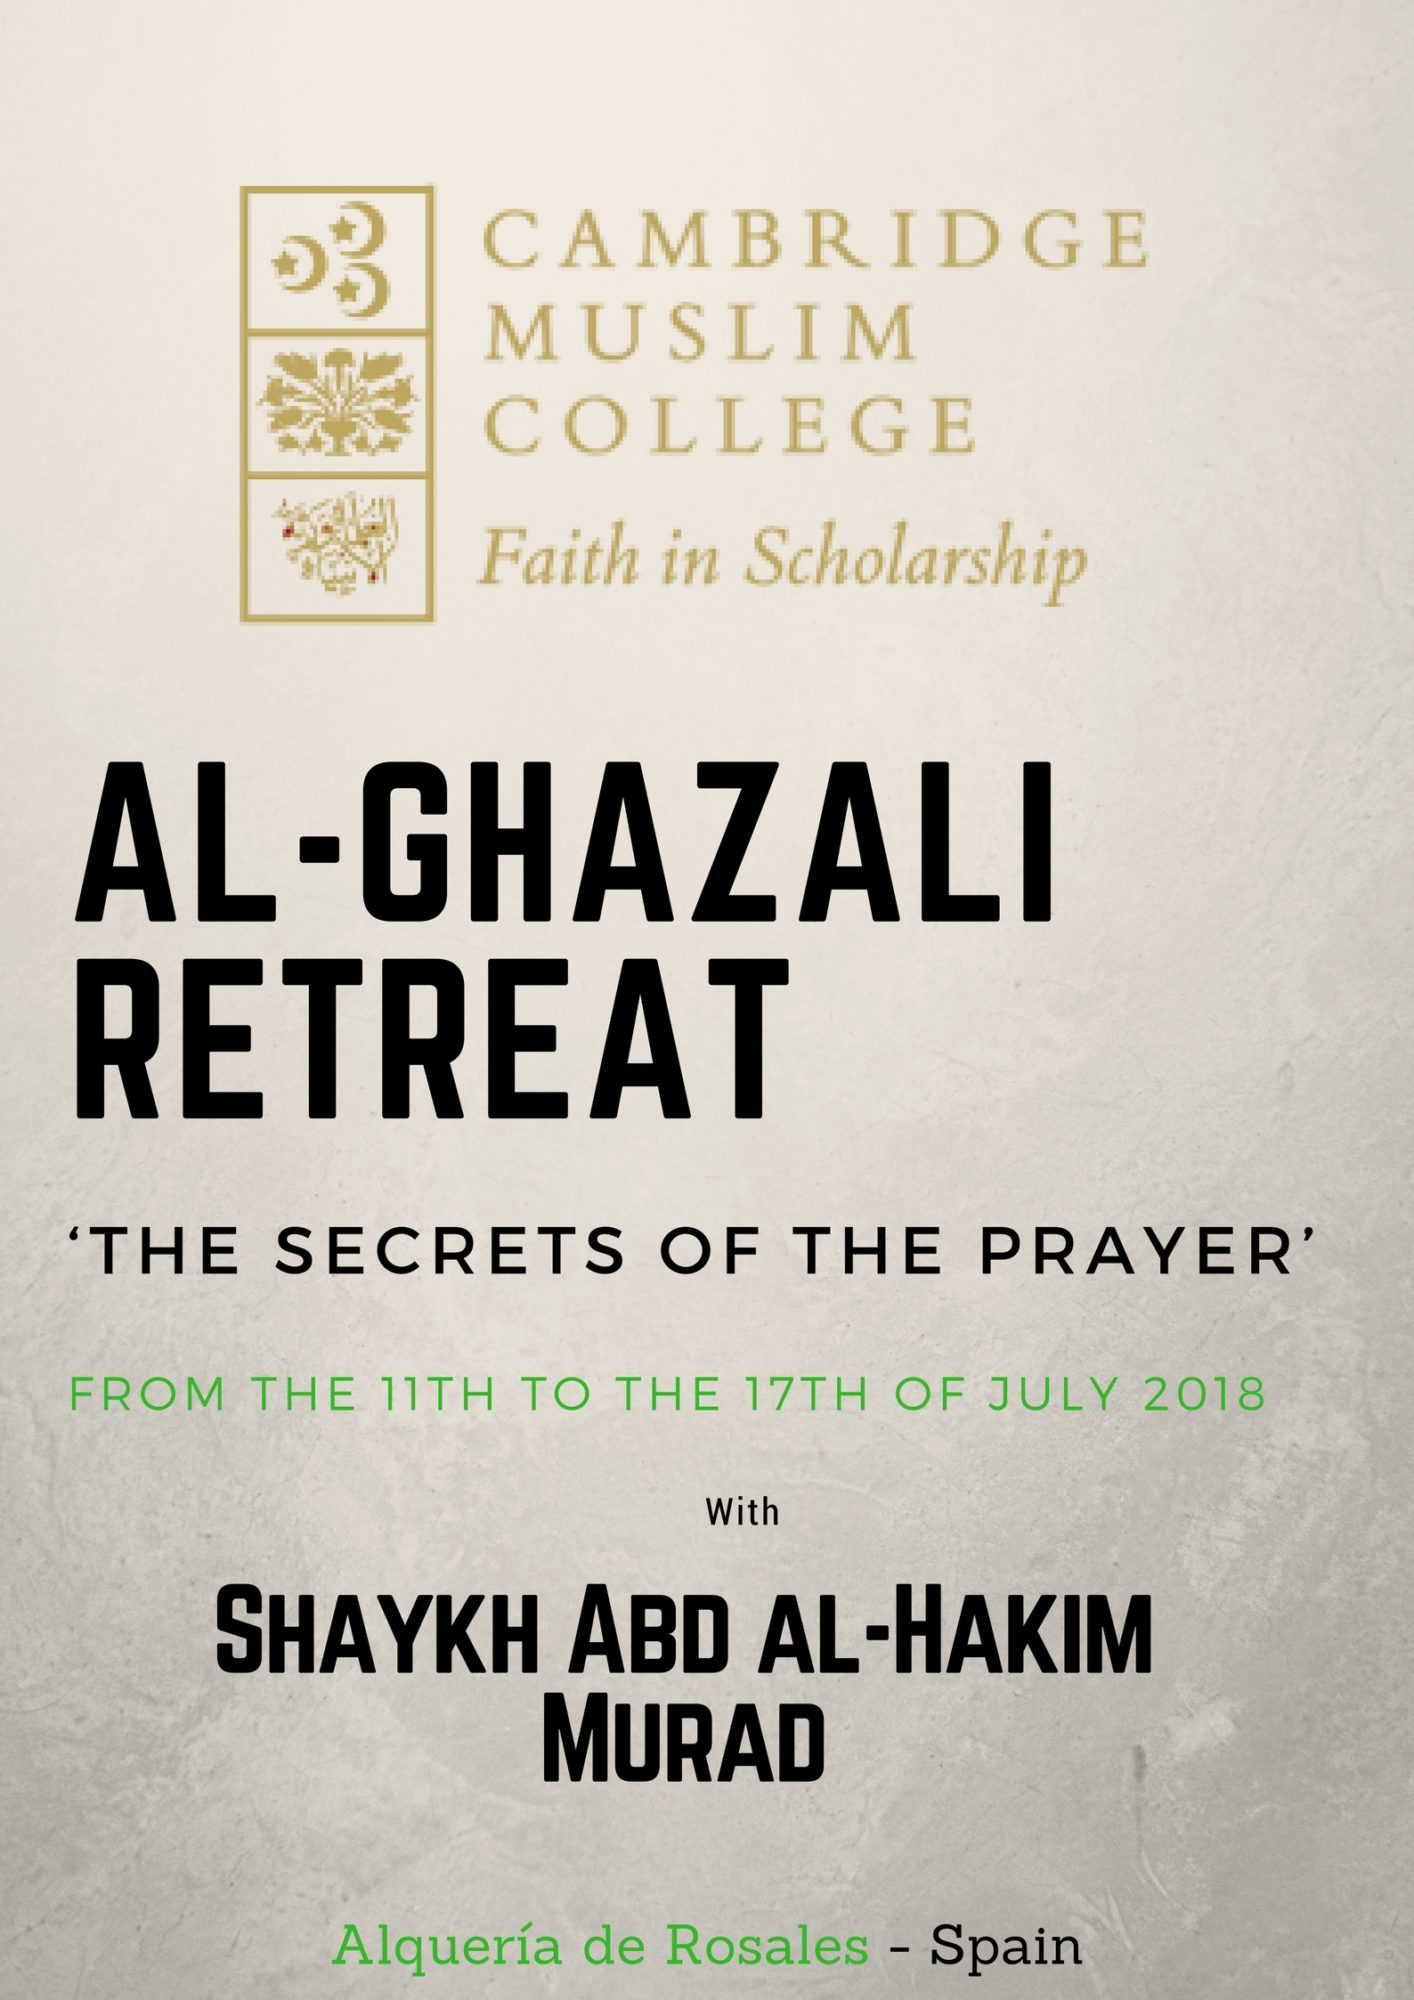 AL-GHAZALI RETREAT